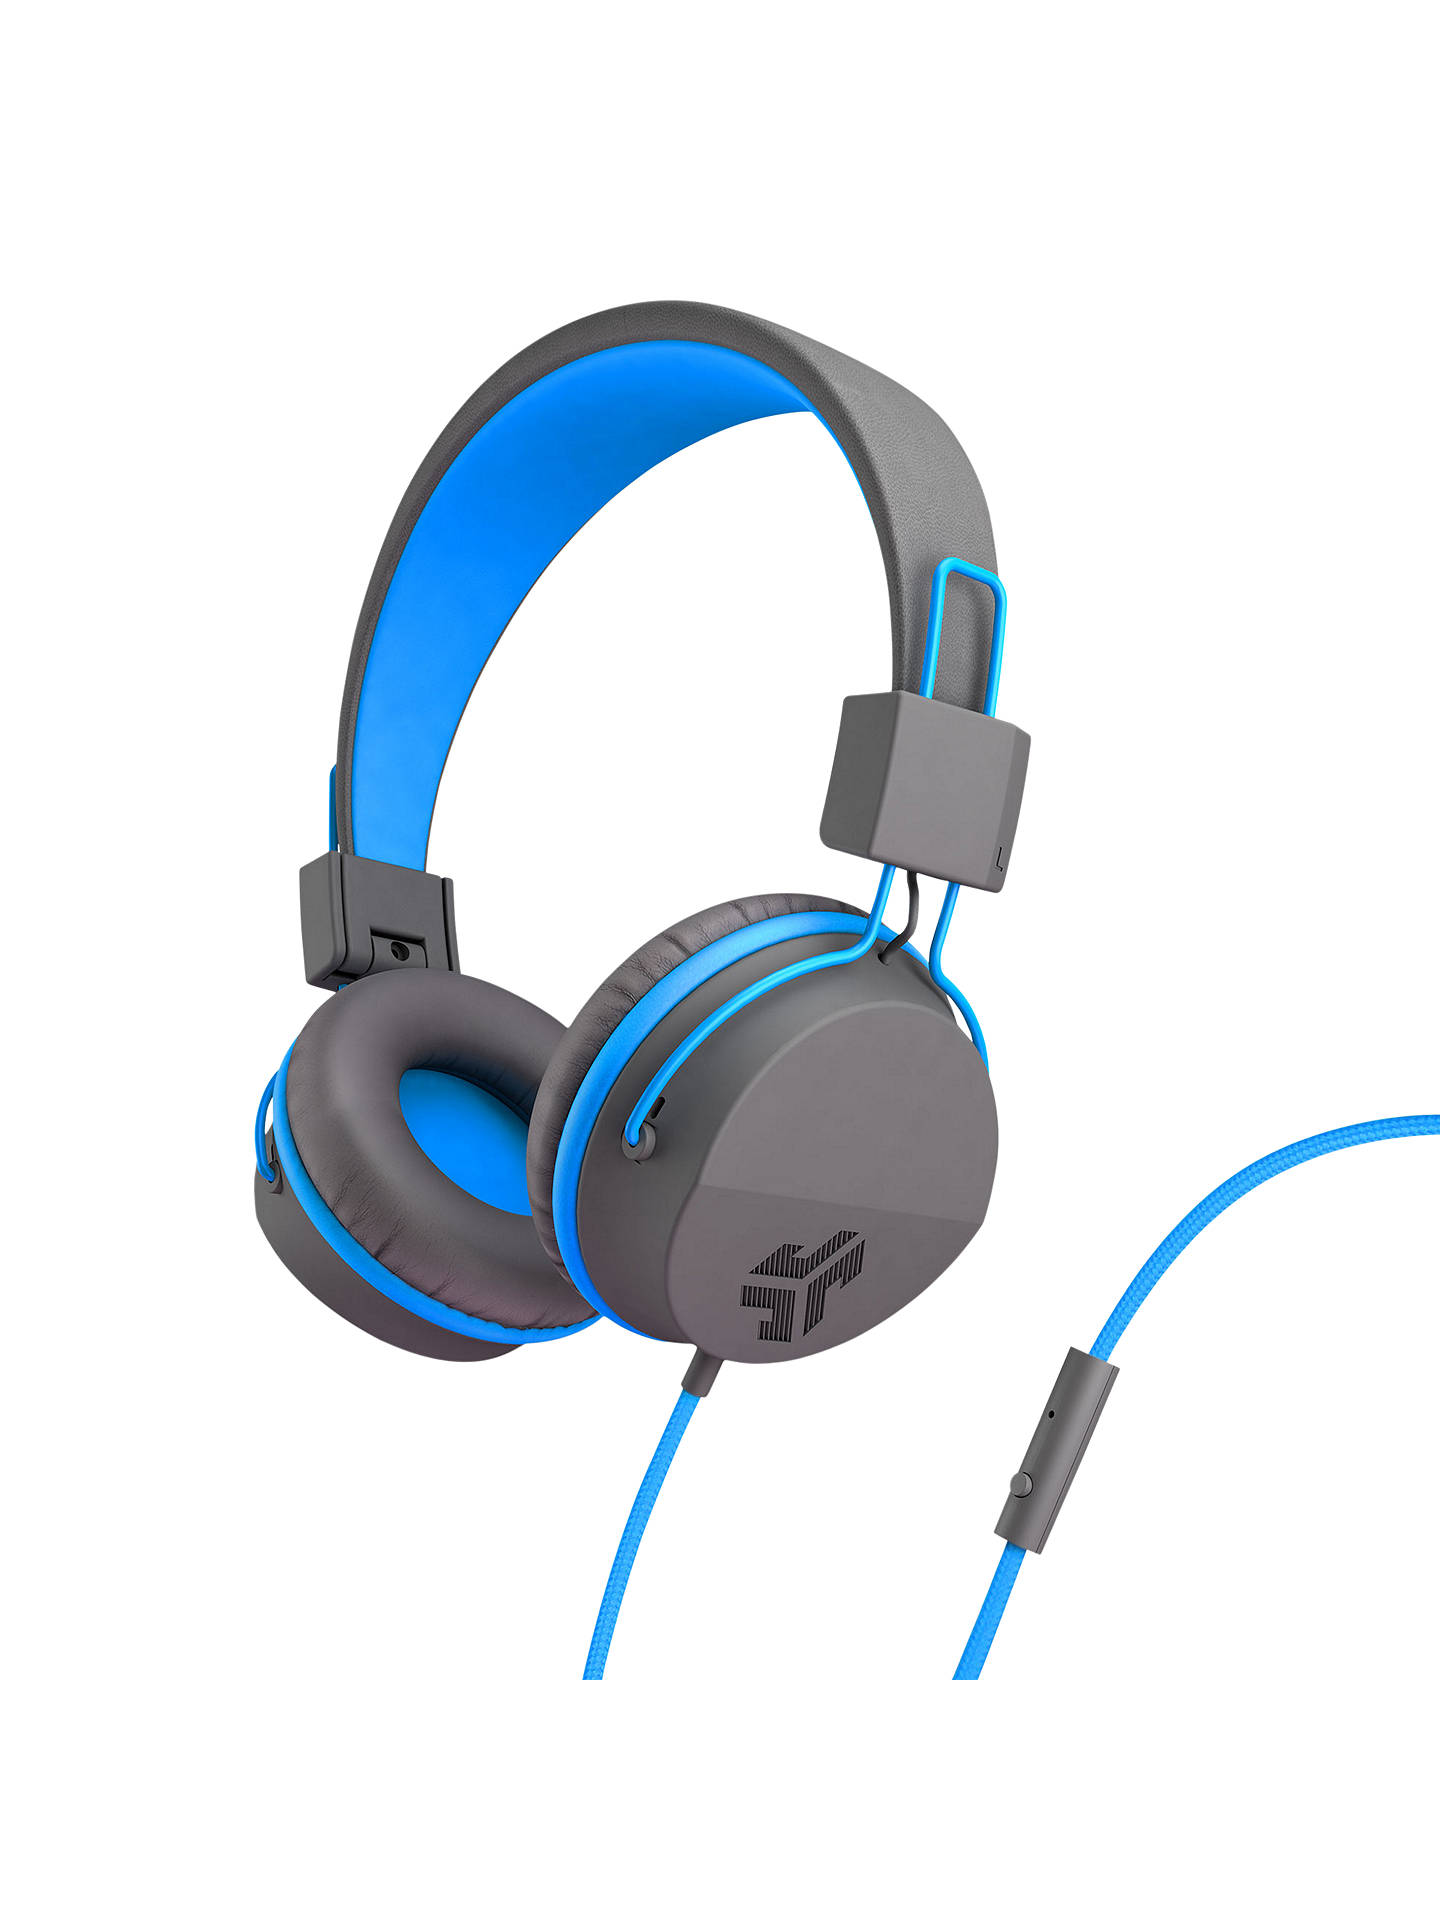 bc15e59da0b Buy JLab Audio JBuddies Studio Children's Volume Limiting Over-Ear  Headphones with Mic/Remote ...